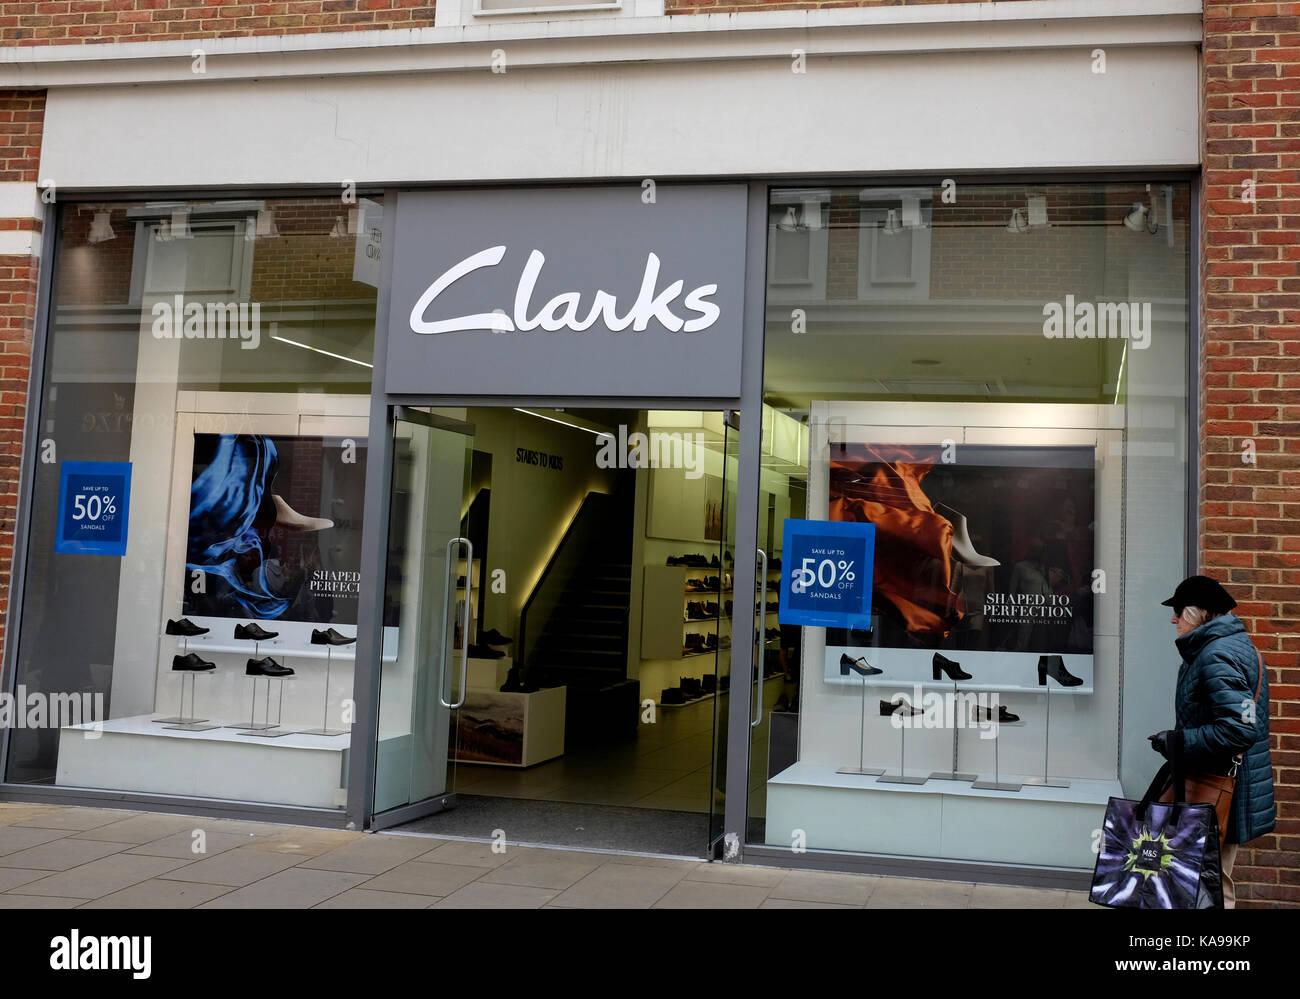 Pesimista Península Pensativo  clarks retail shoe shop in city of canterbury kent uk september 2017 Stock  Photo - Alamy